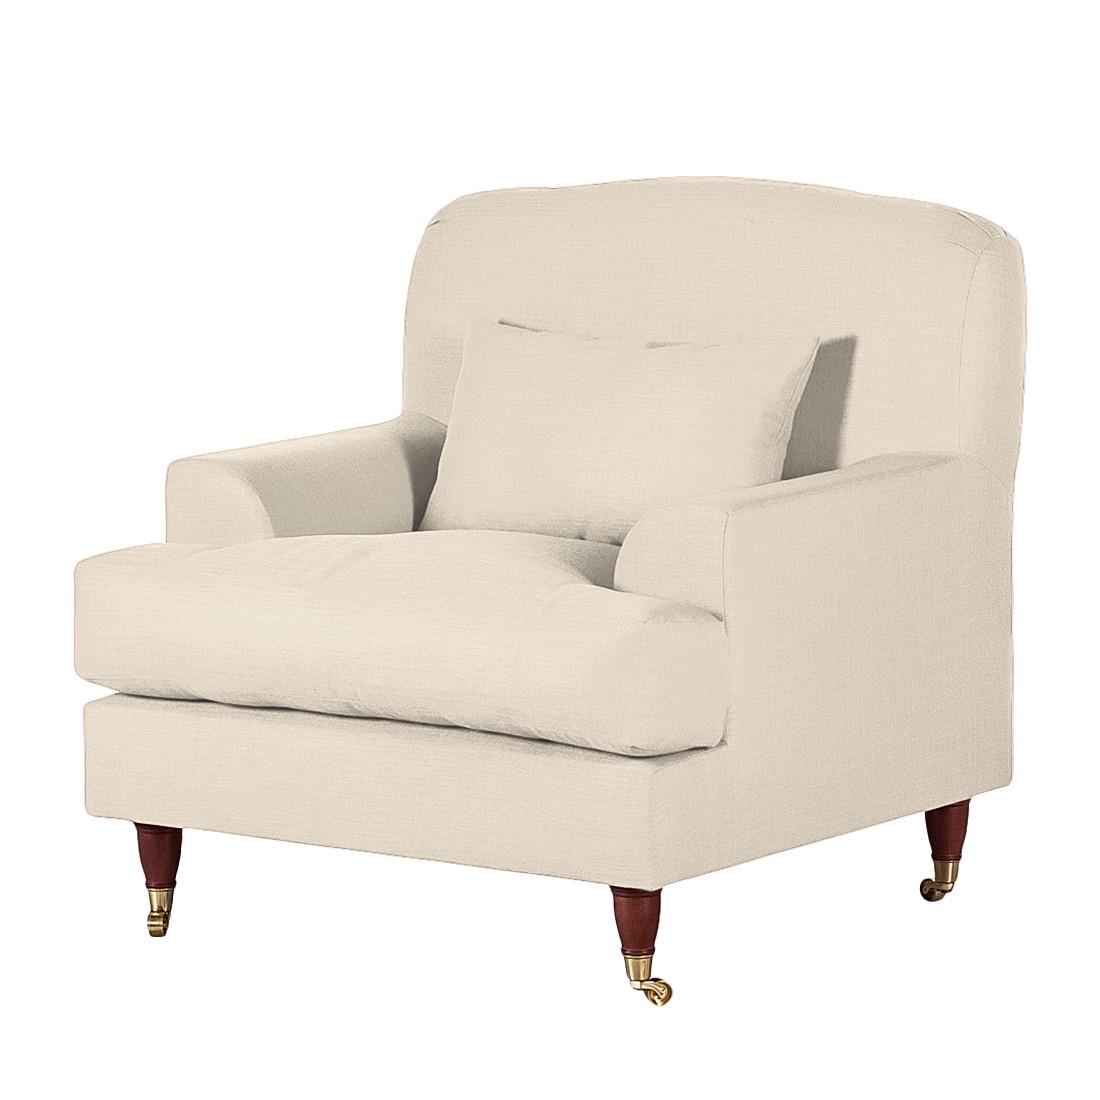 Sessel Bent – Webstoff Beige, Maison Belfort günstig online kaufen